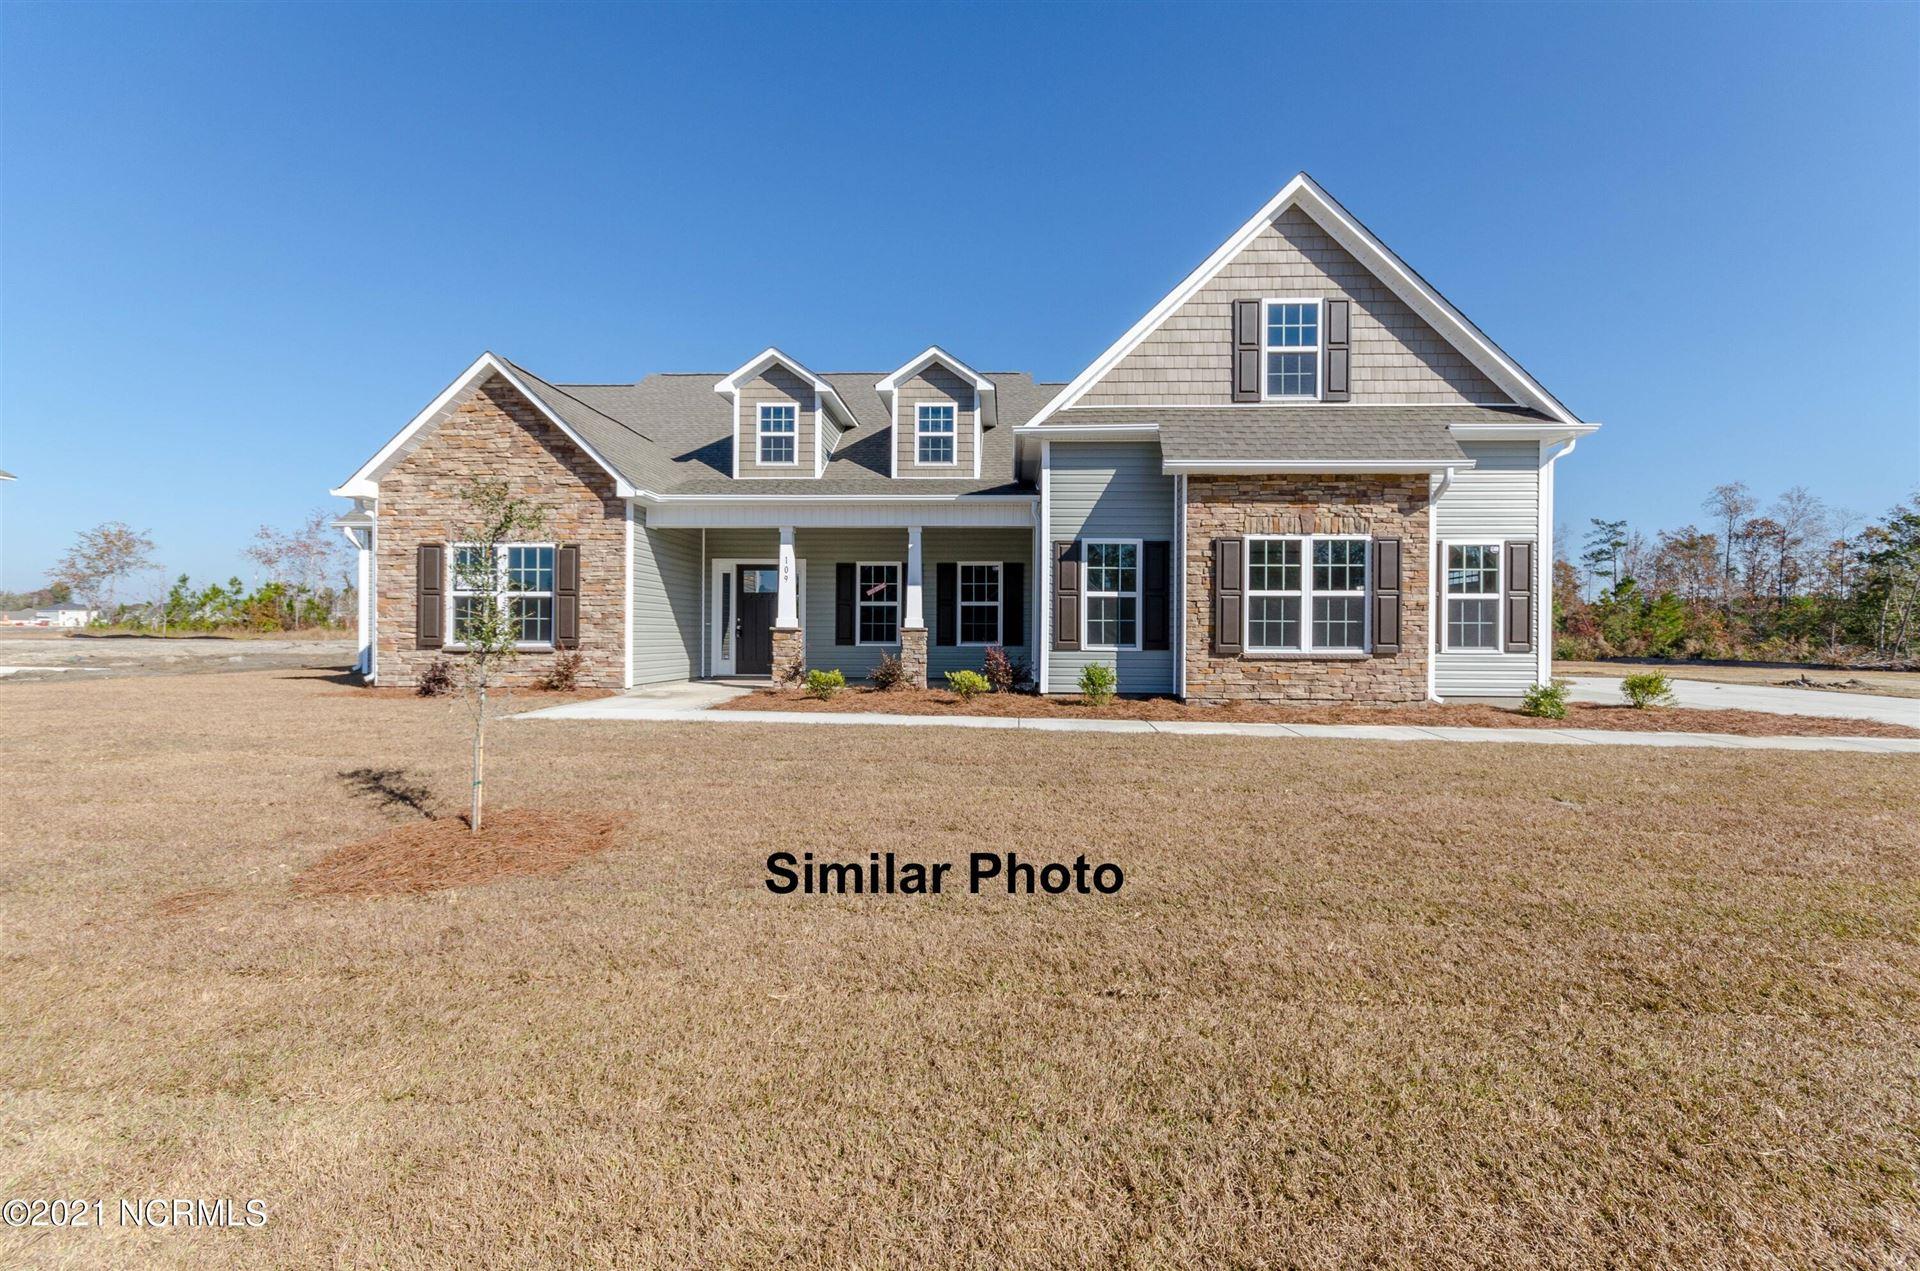 Photo of 505 Jarrott's Place, Jacksonville, NC 28546 (MLS # 100290379)